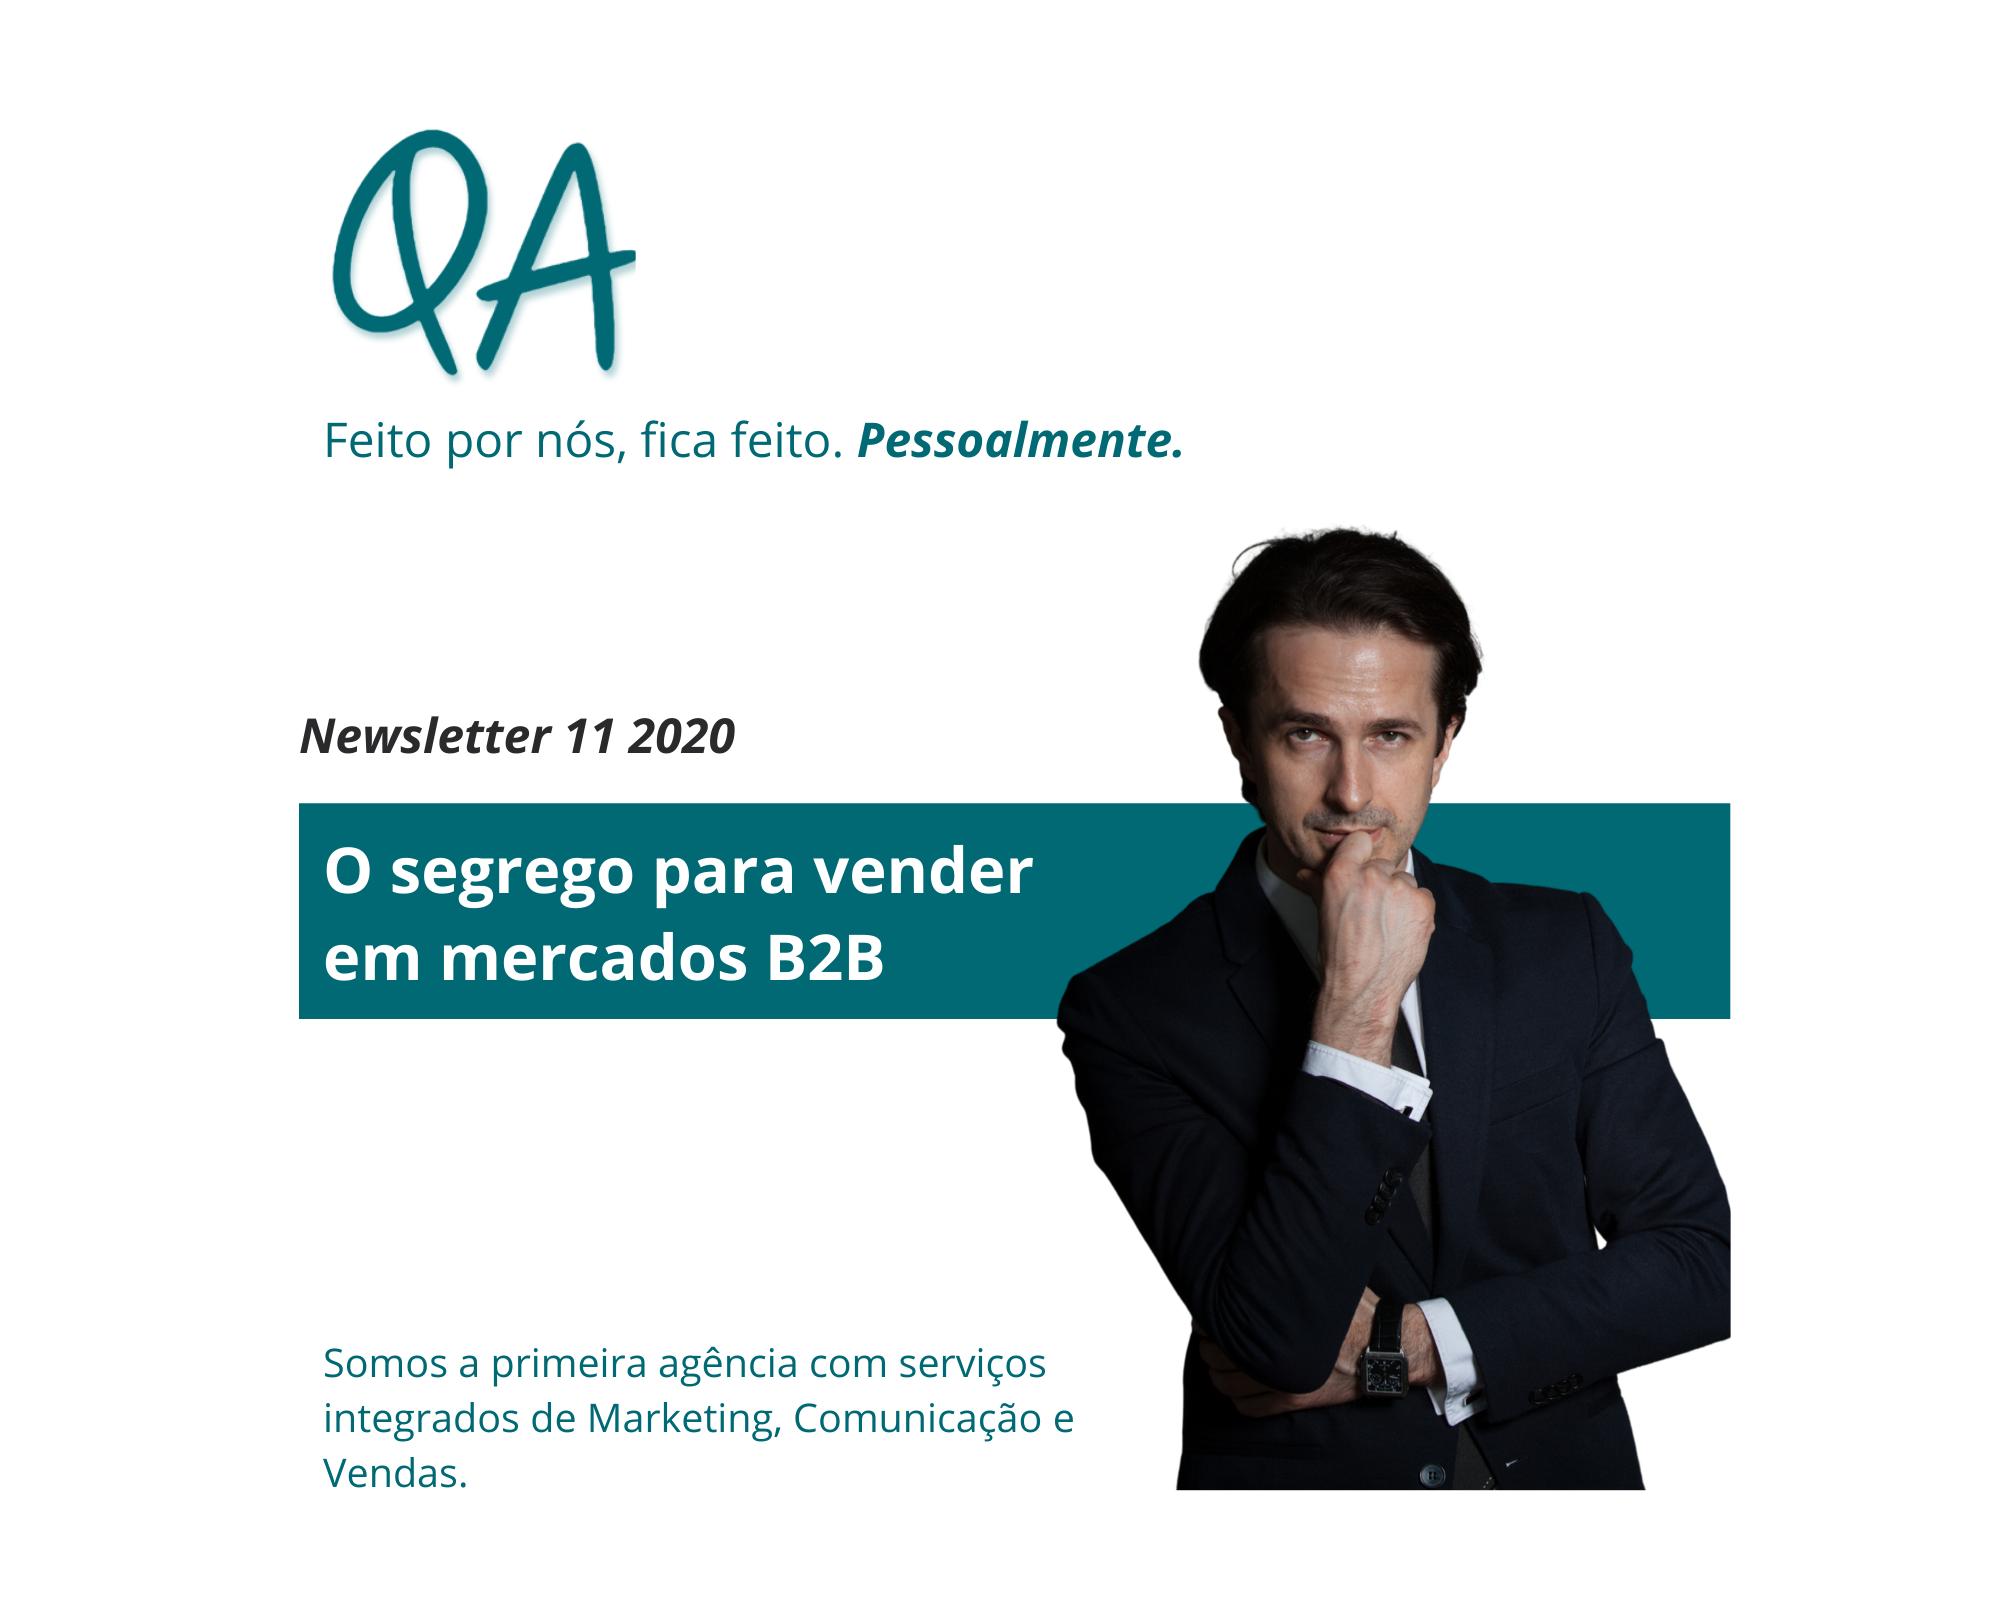 newsletter novembro 2020 qa vender em b2b